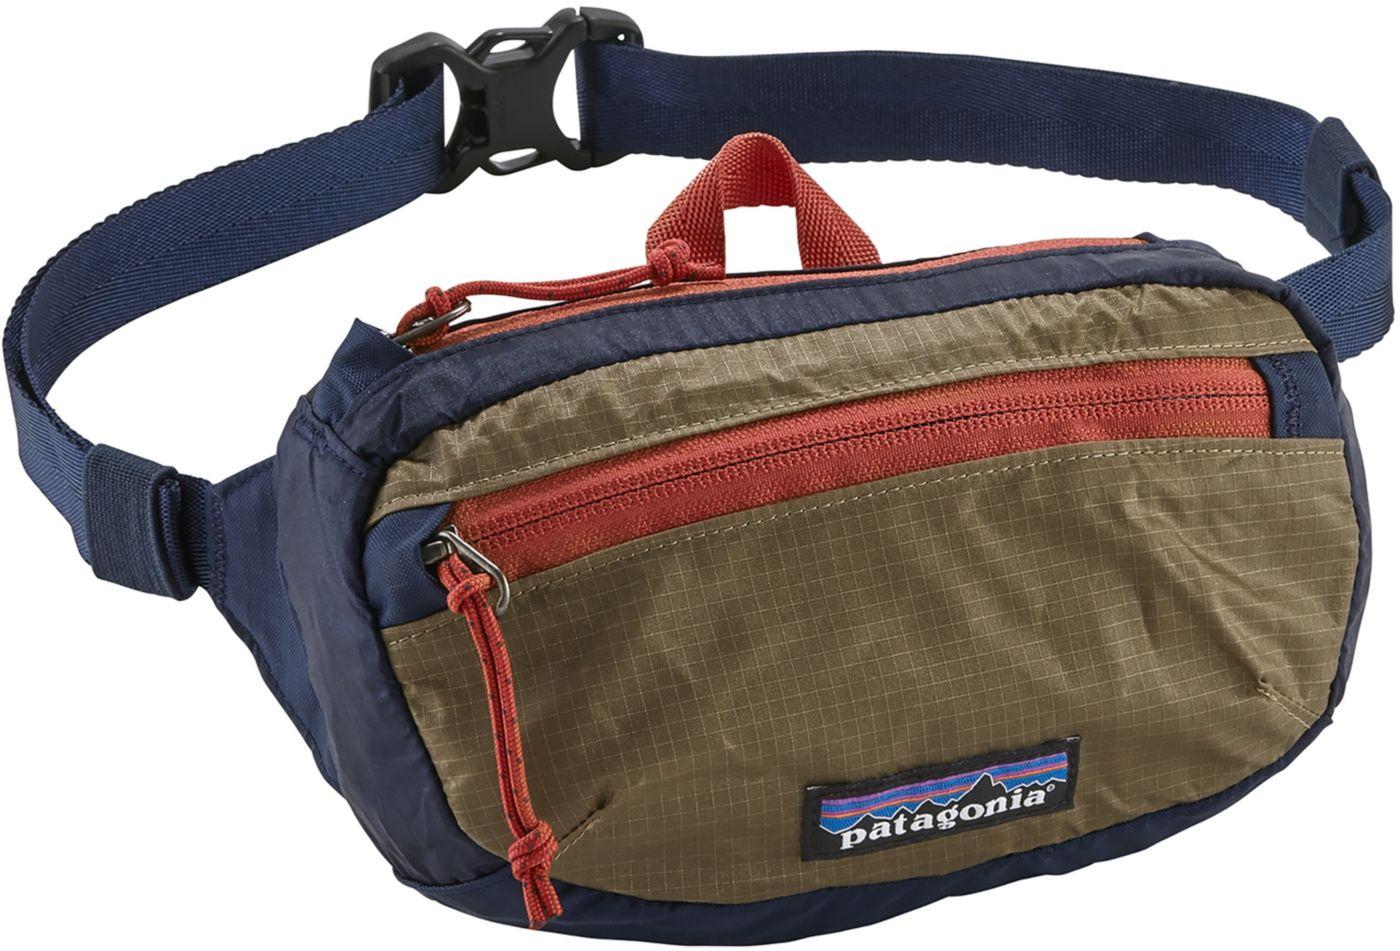 Patagonia Lightweight Travel Mini Waist Pack